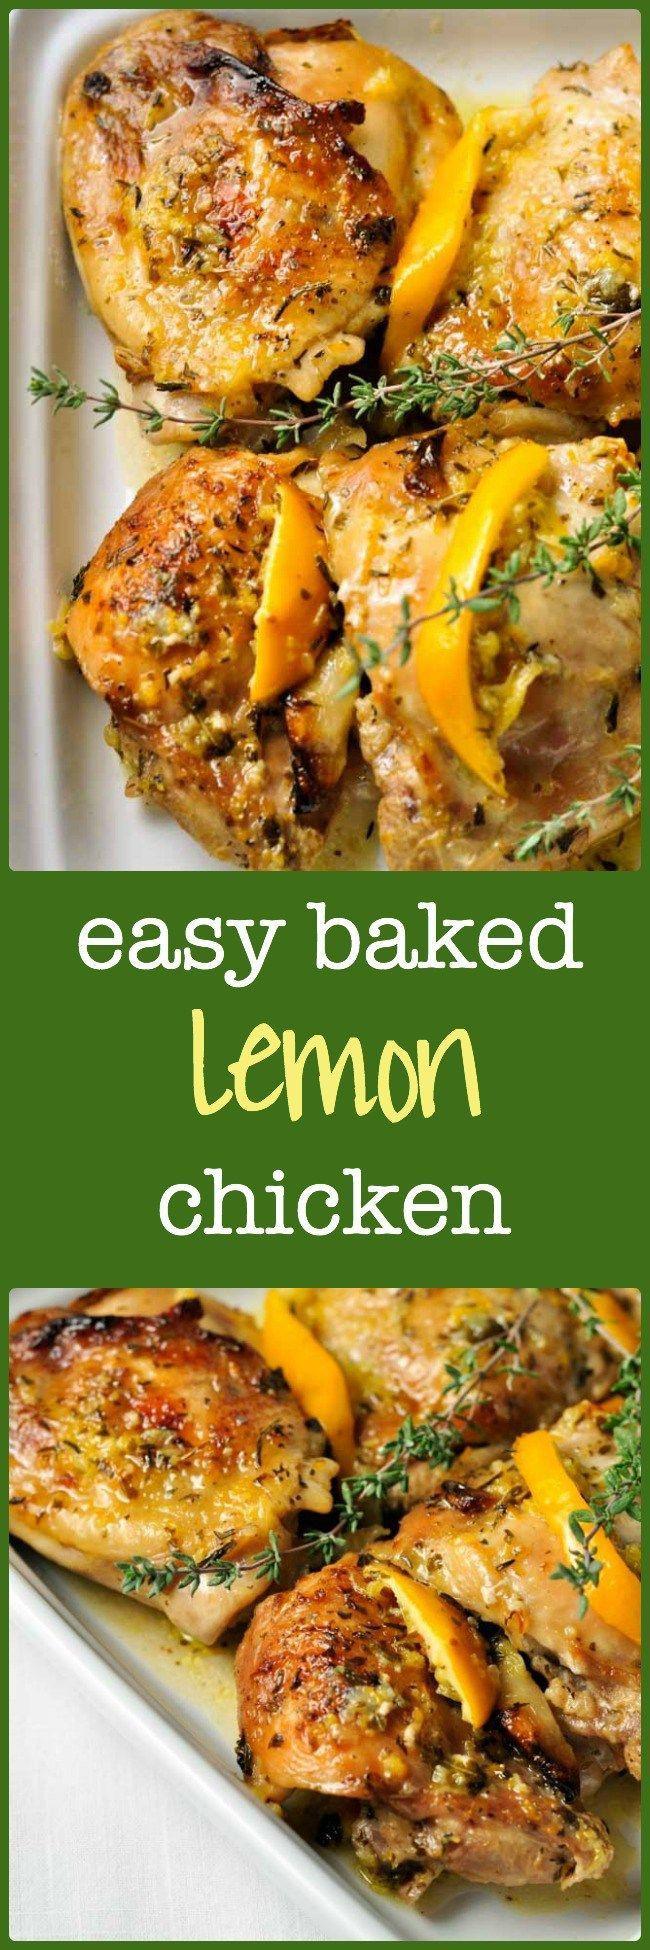 Easy Healthy Baked Chicken Recipes  Easy Baked Lemon Chicken Recipe